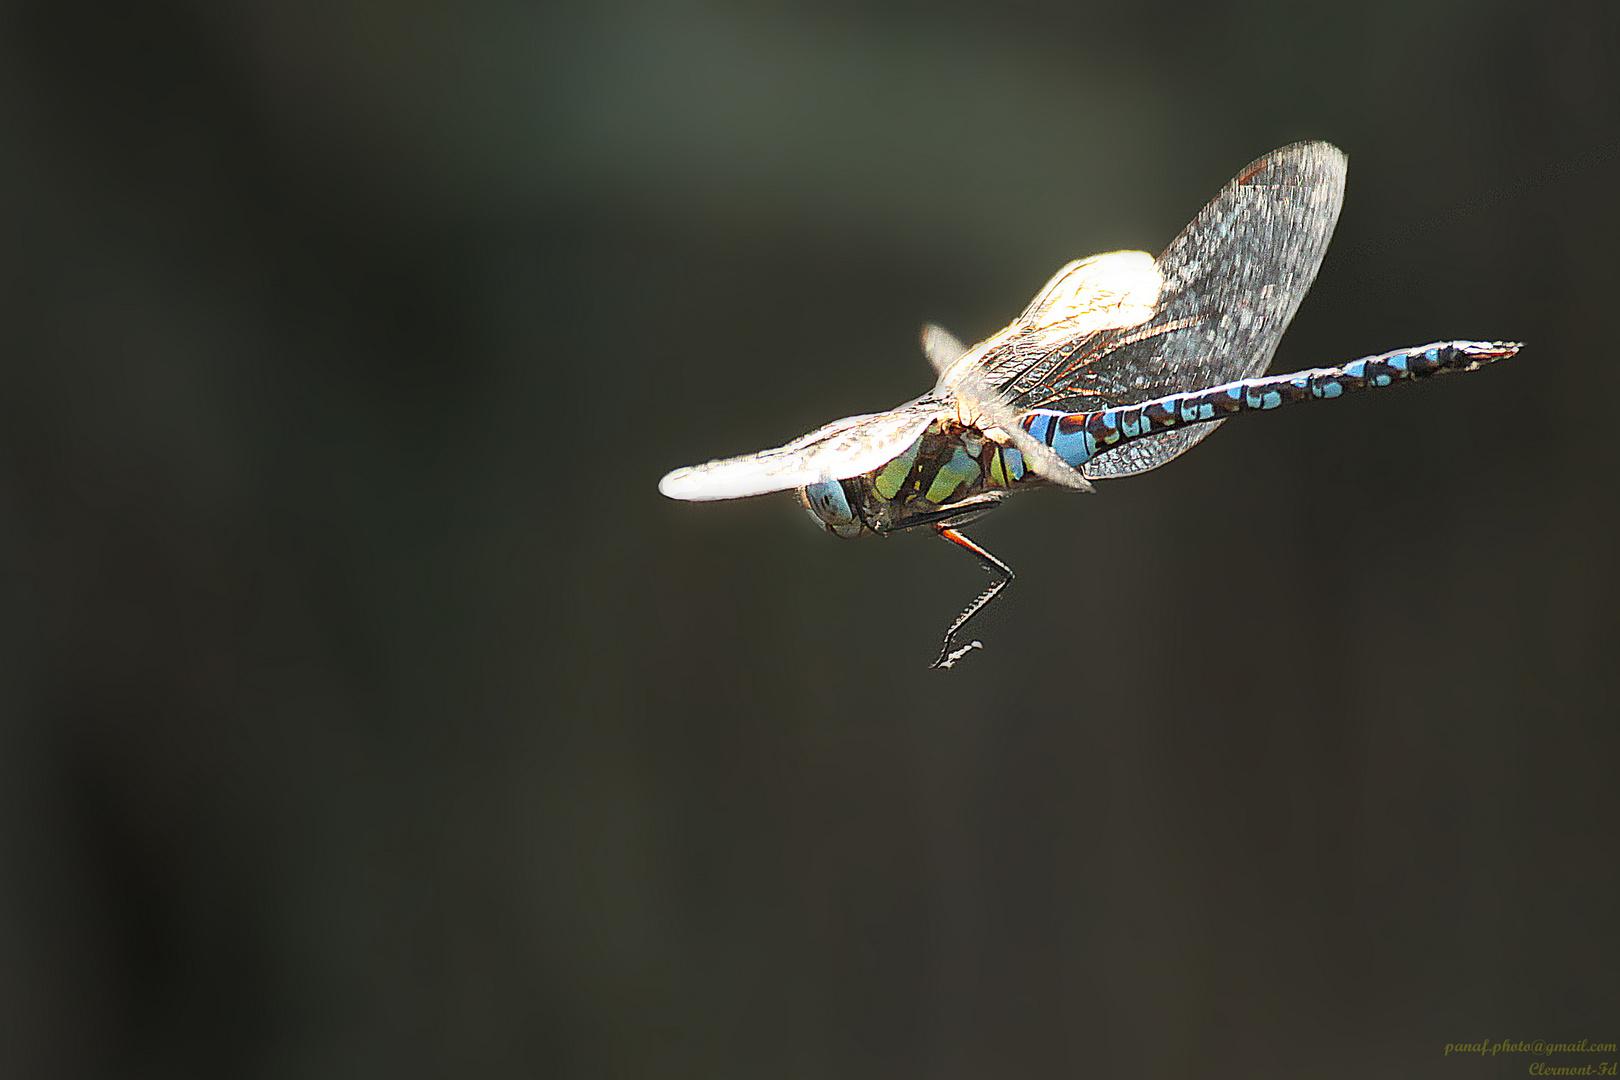 Un arc-en-ciel volant